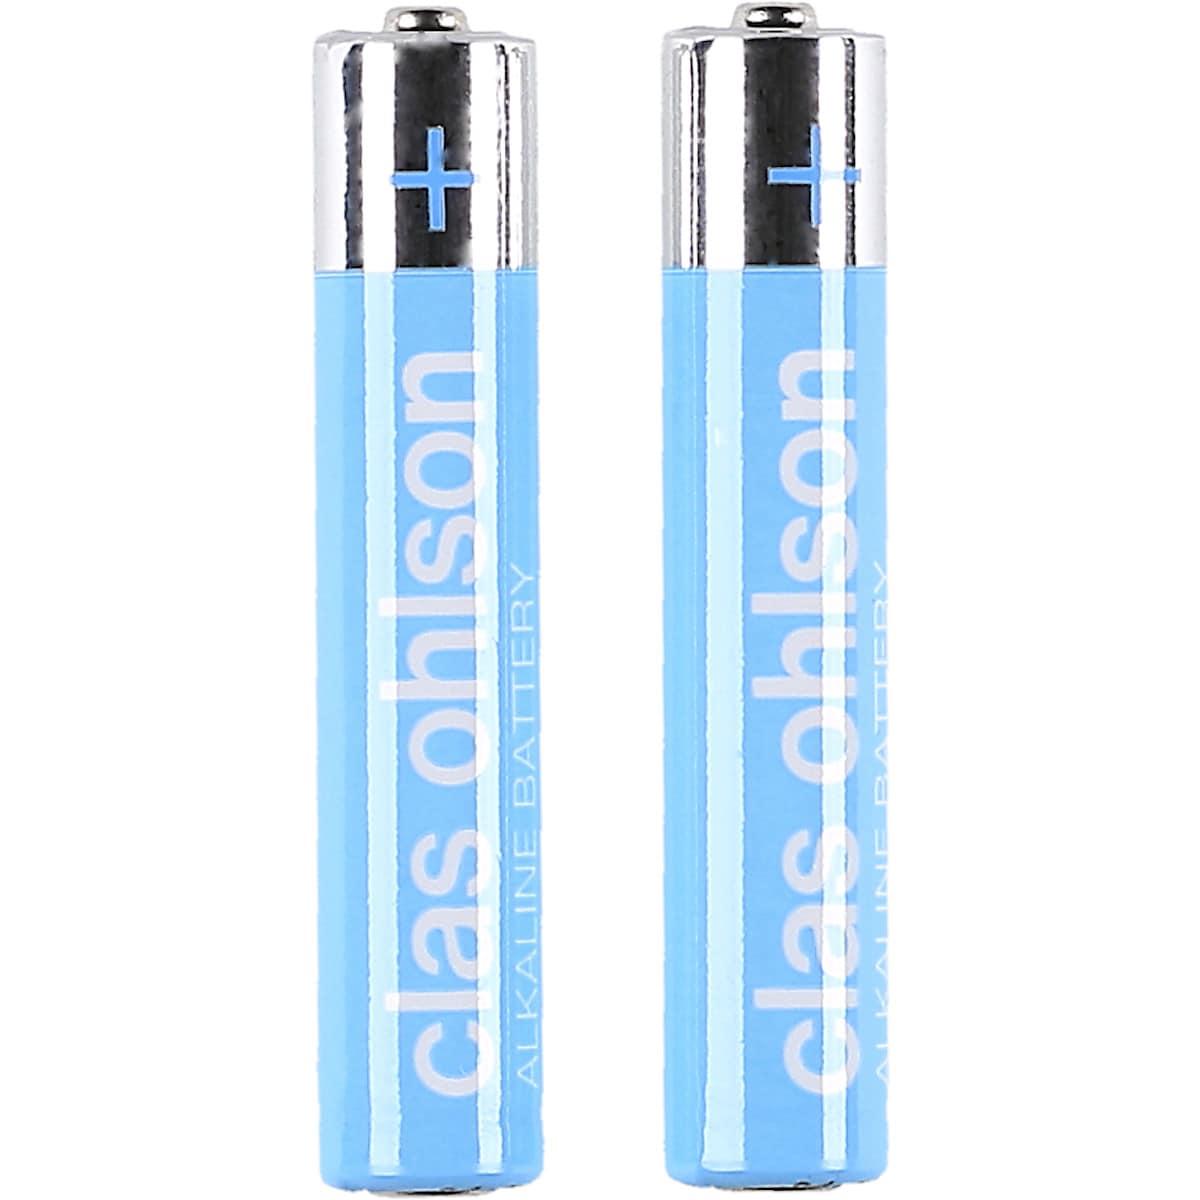 AAAA/LR61 Alkaline Batteries